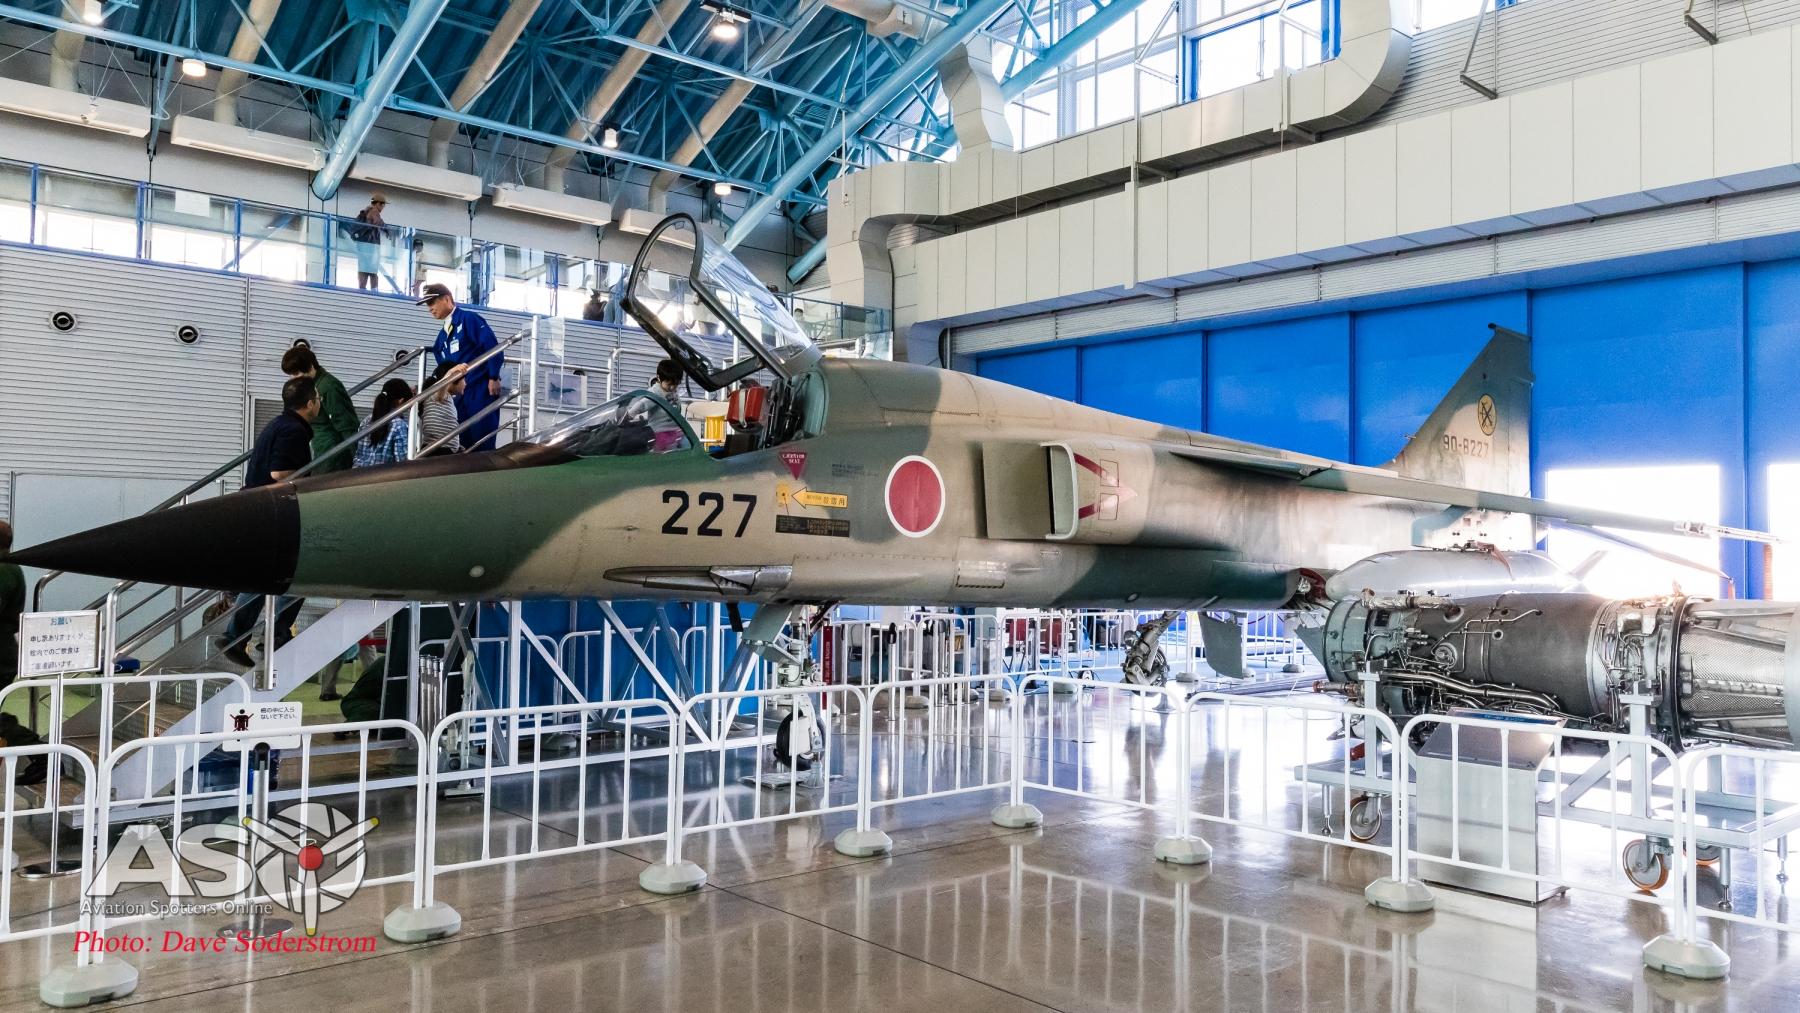 JASDF-Museum-2018-23-1-of-1